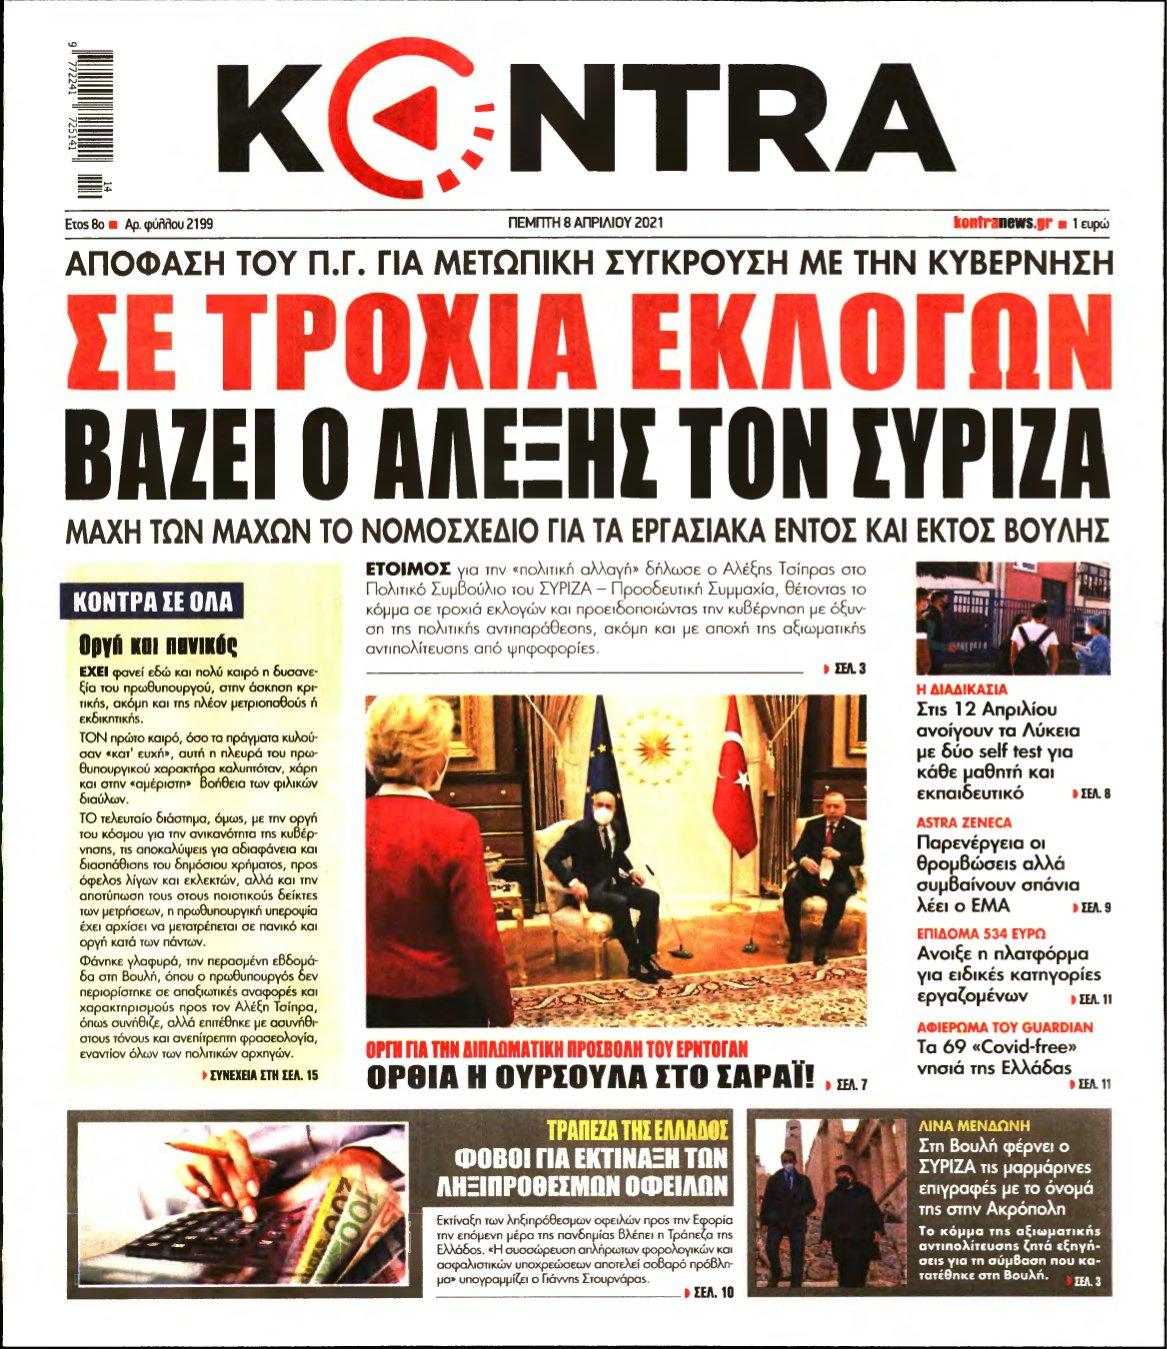 KONTRA NEWS – 08/04/2021